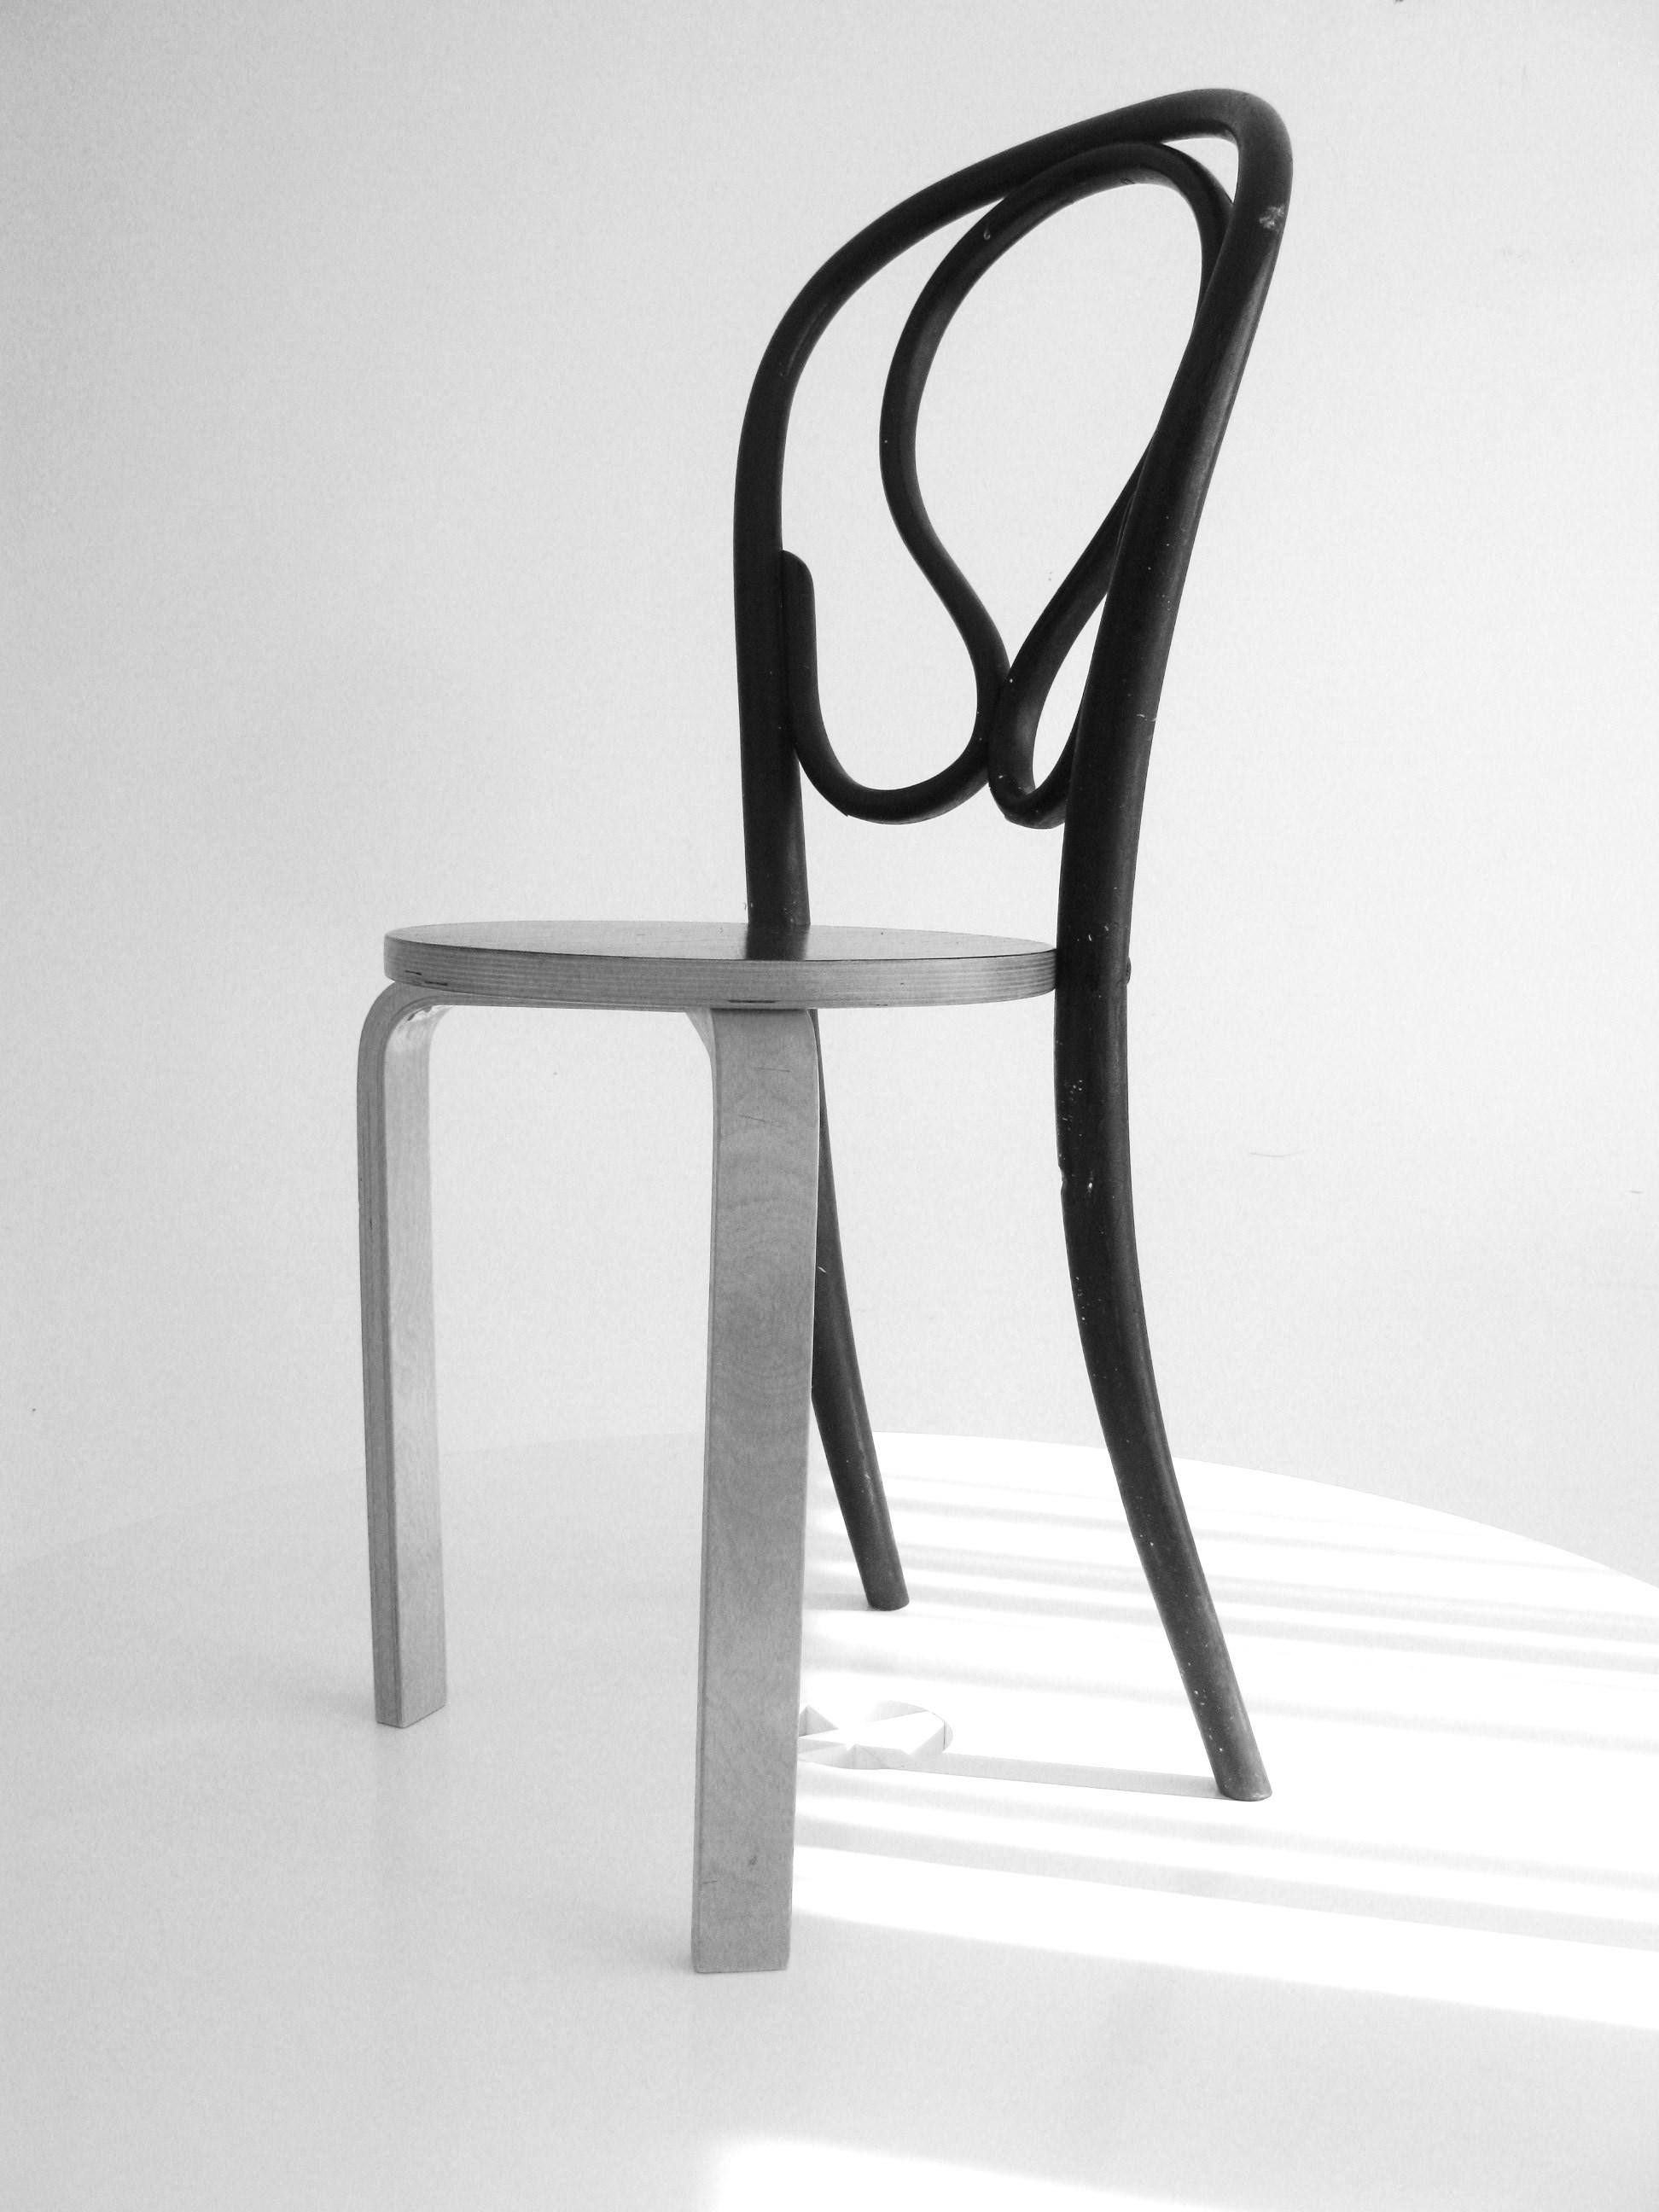 La silla Aalthonet, una silla mestiza